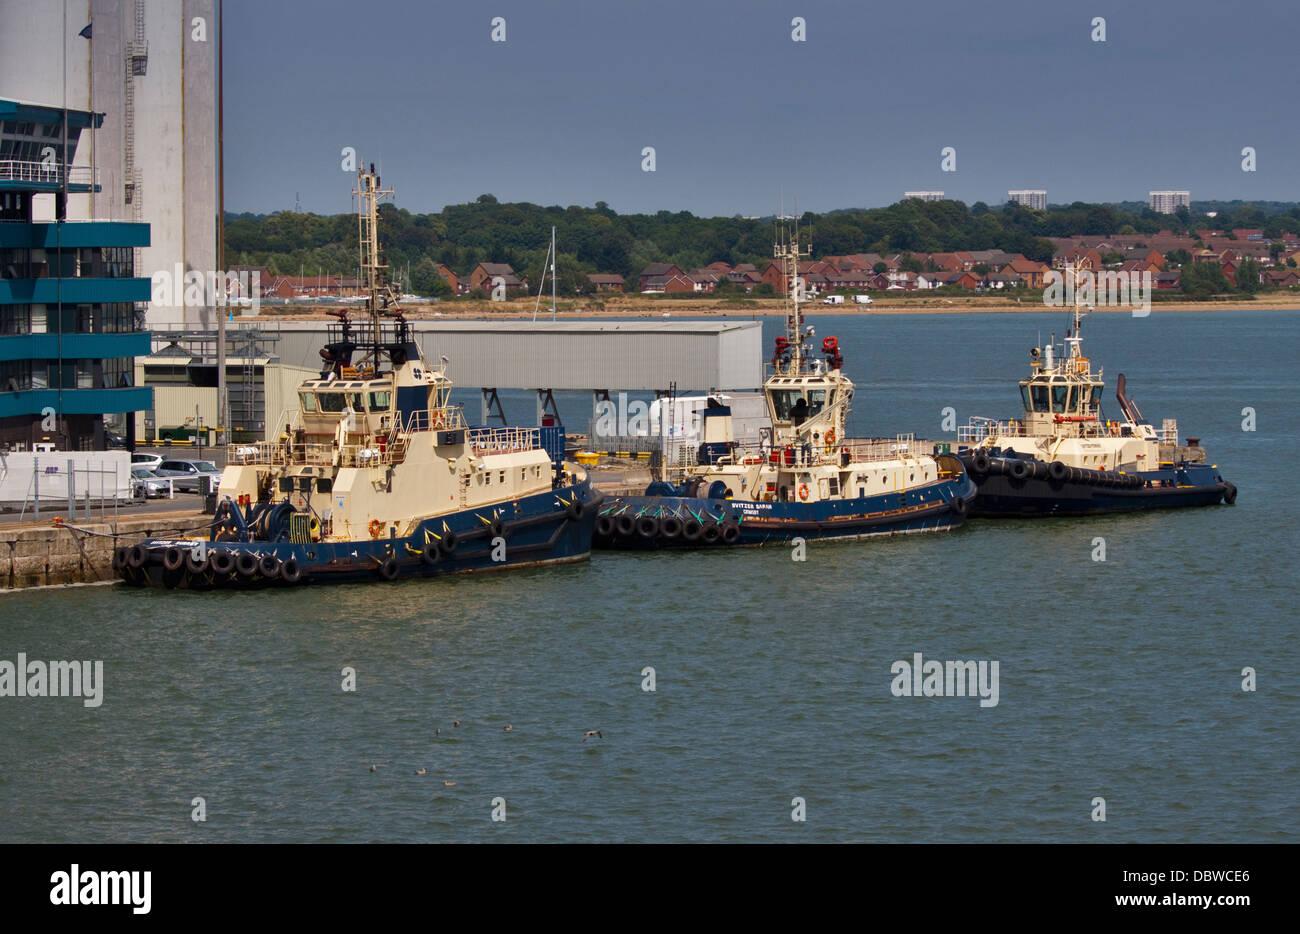 Tug Boats at Southampton Docks, Southampton, Hampshire, England - Stock Image